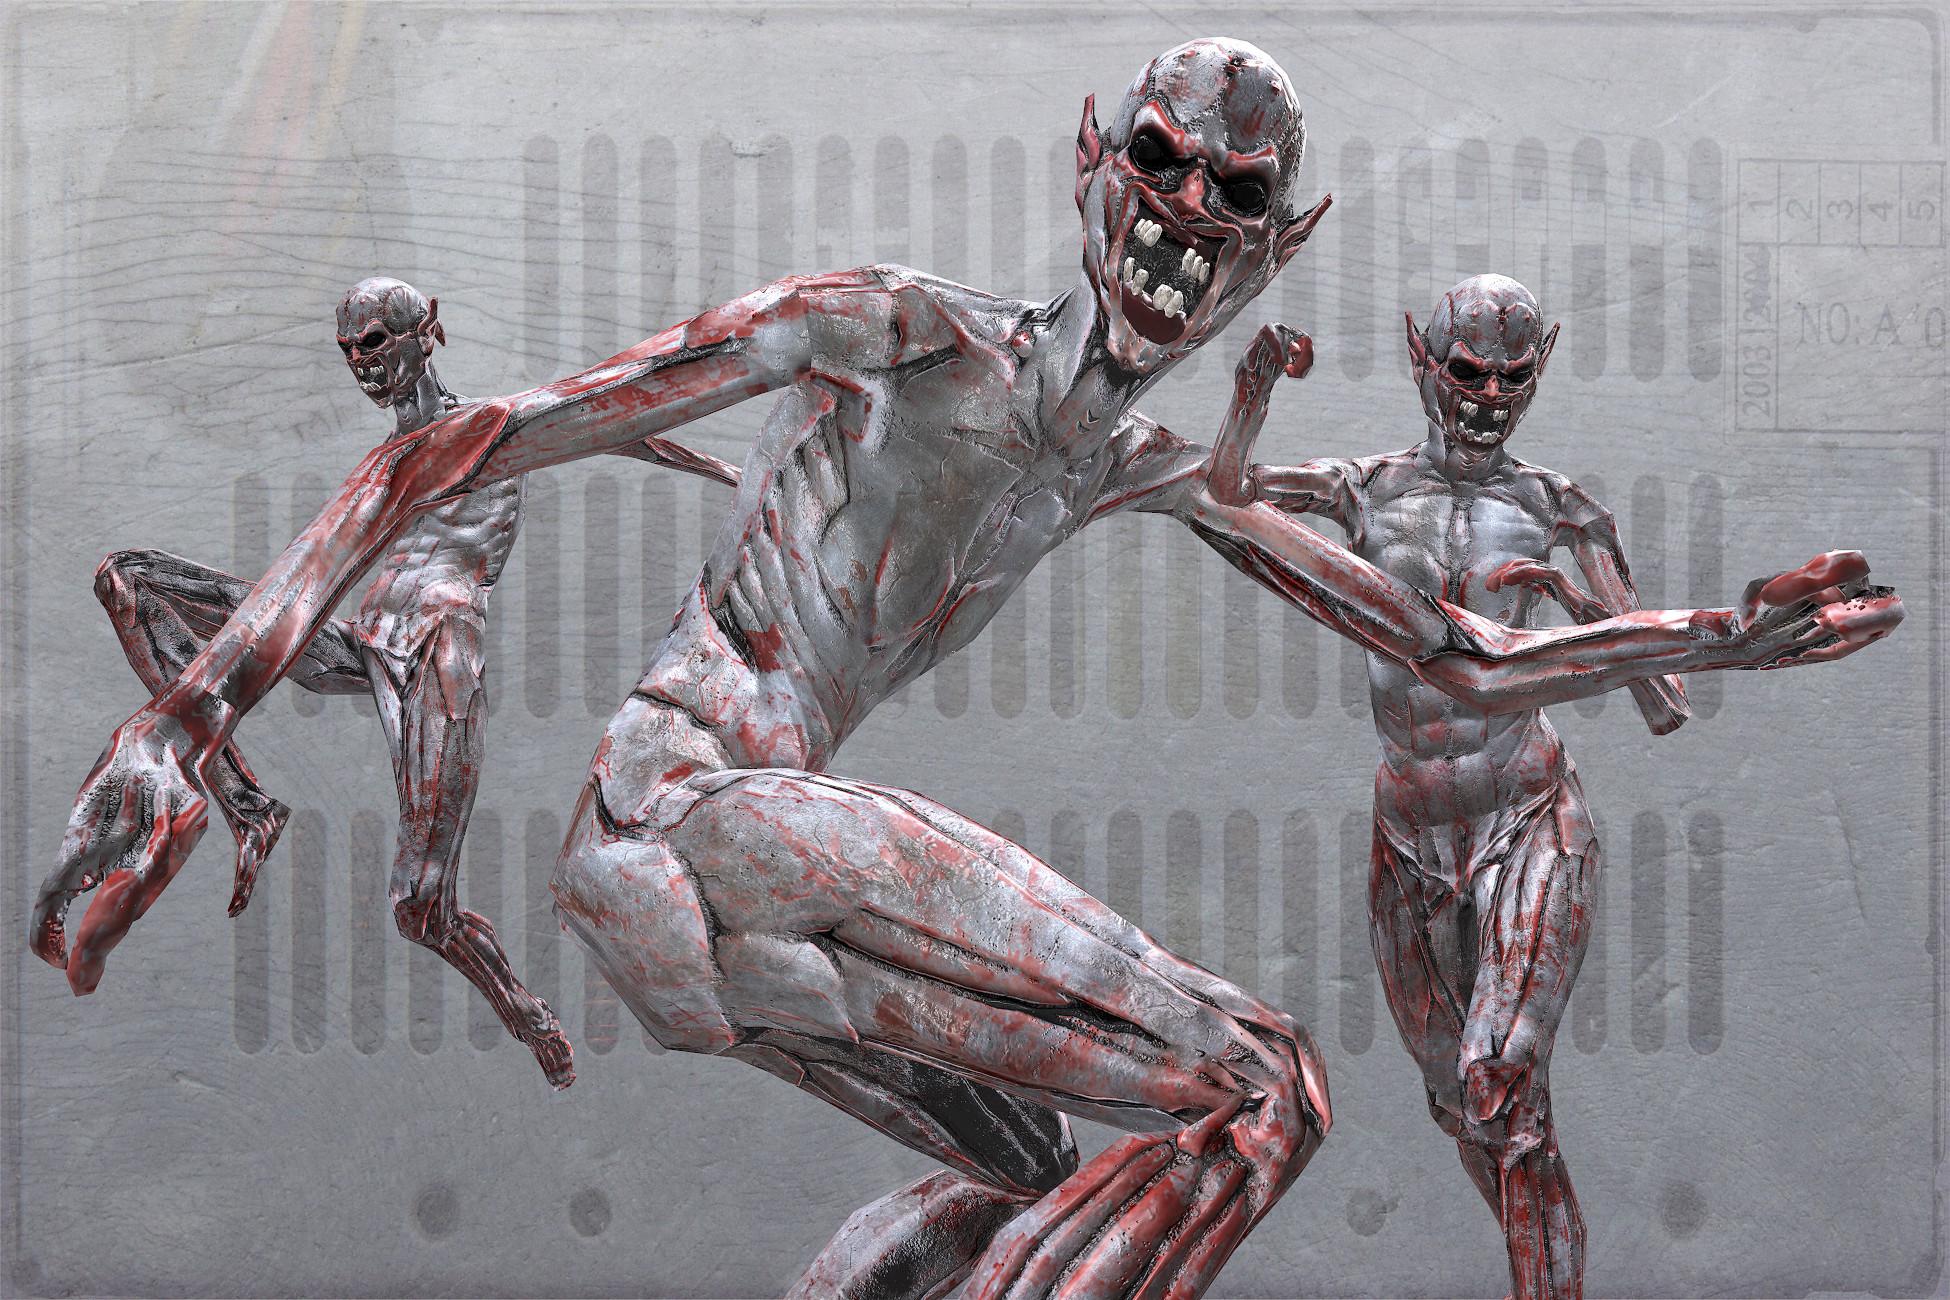 Creature zombie flesh